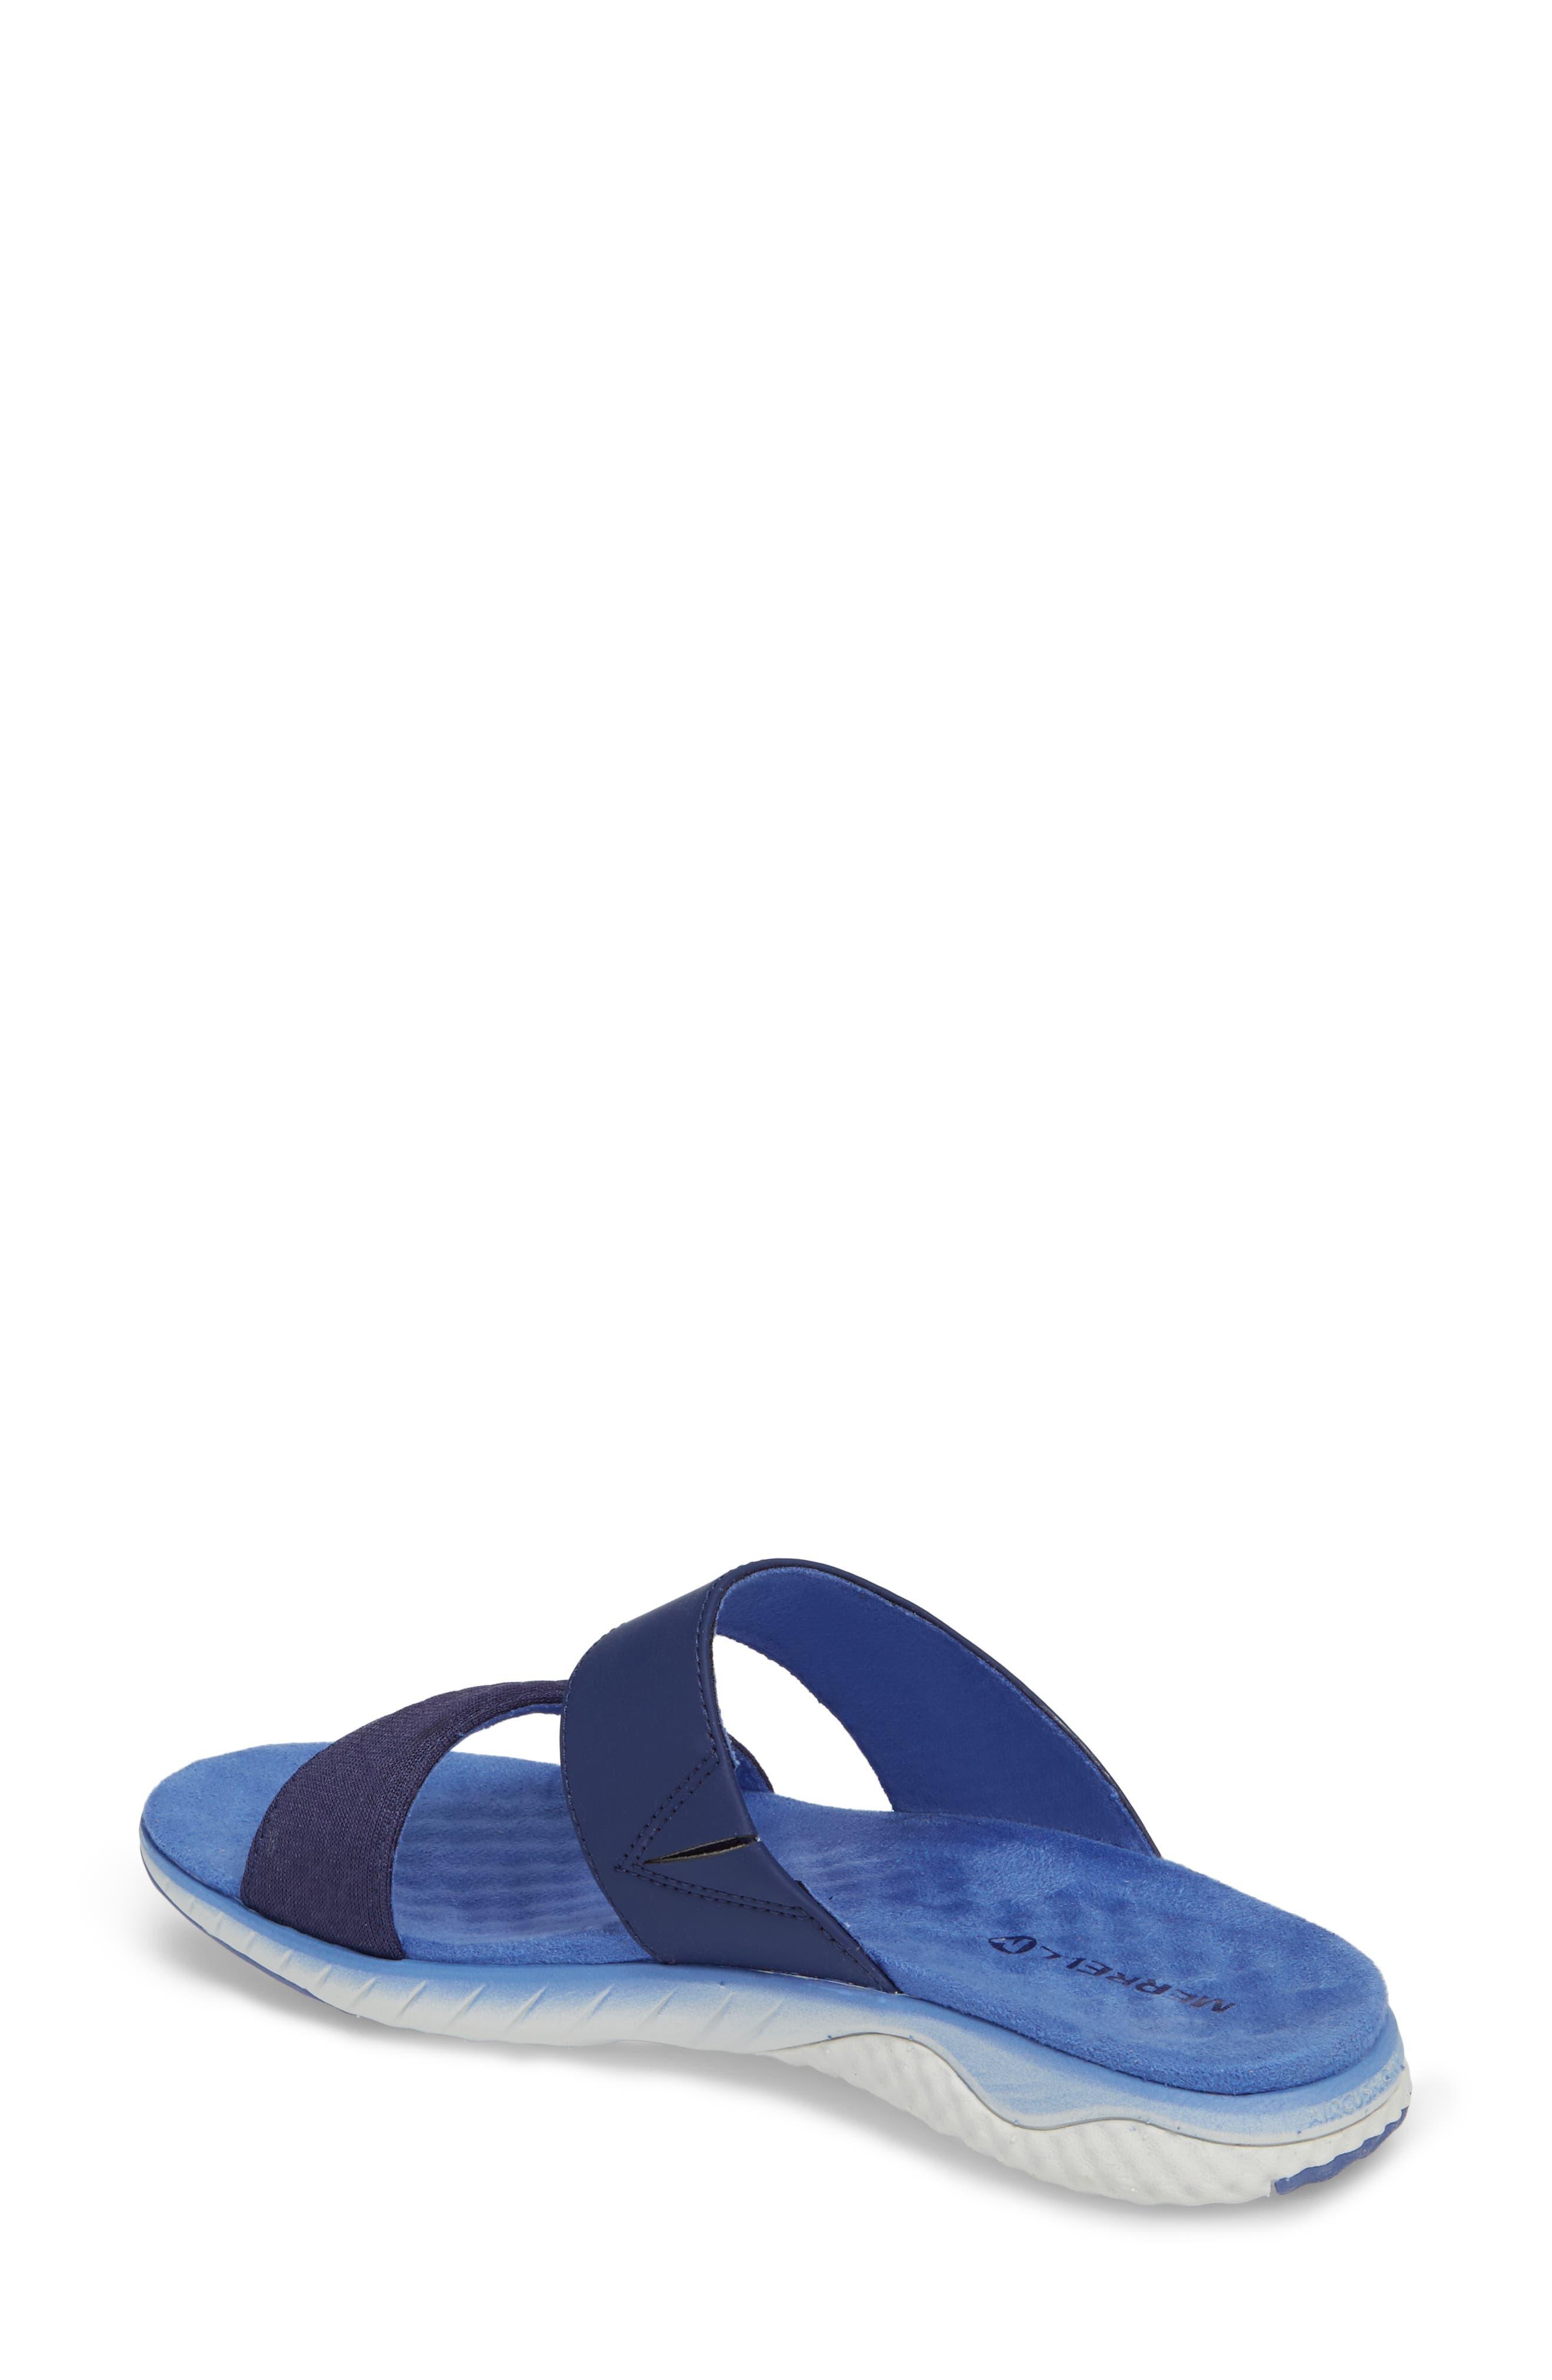 1SIX8 Linna Air Cushion+ Slide Sandal,                             Alternate thumbnail 7, color,